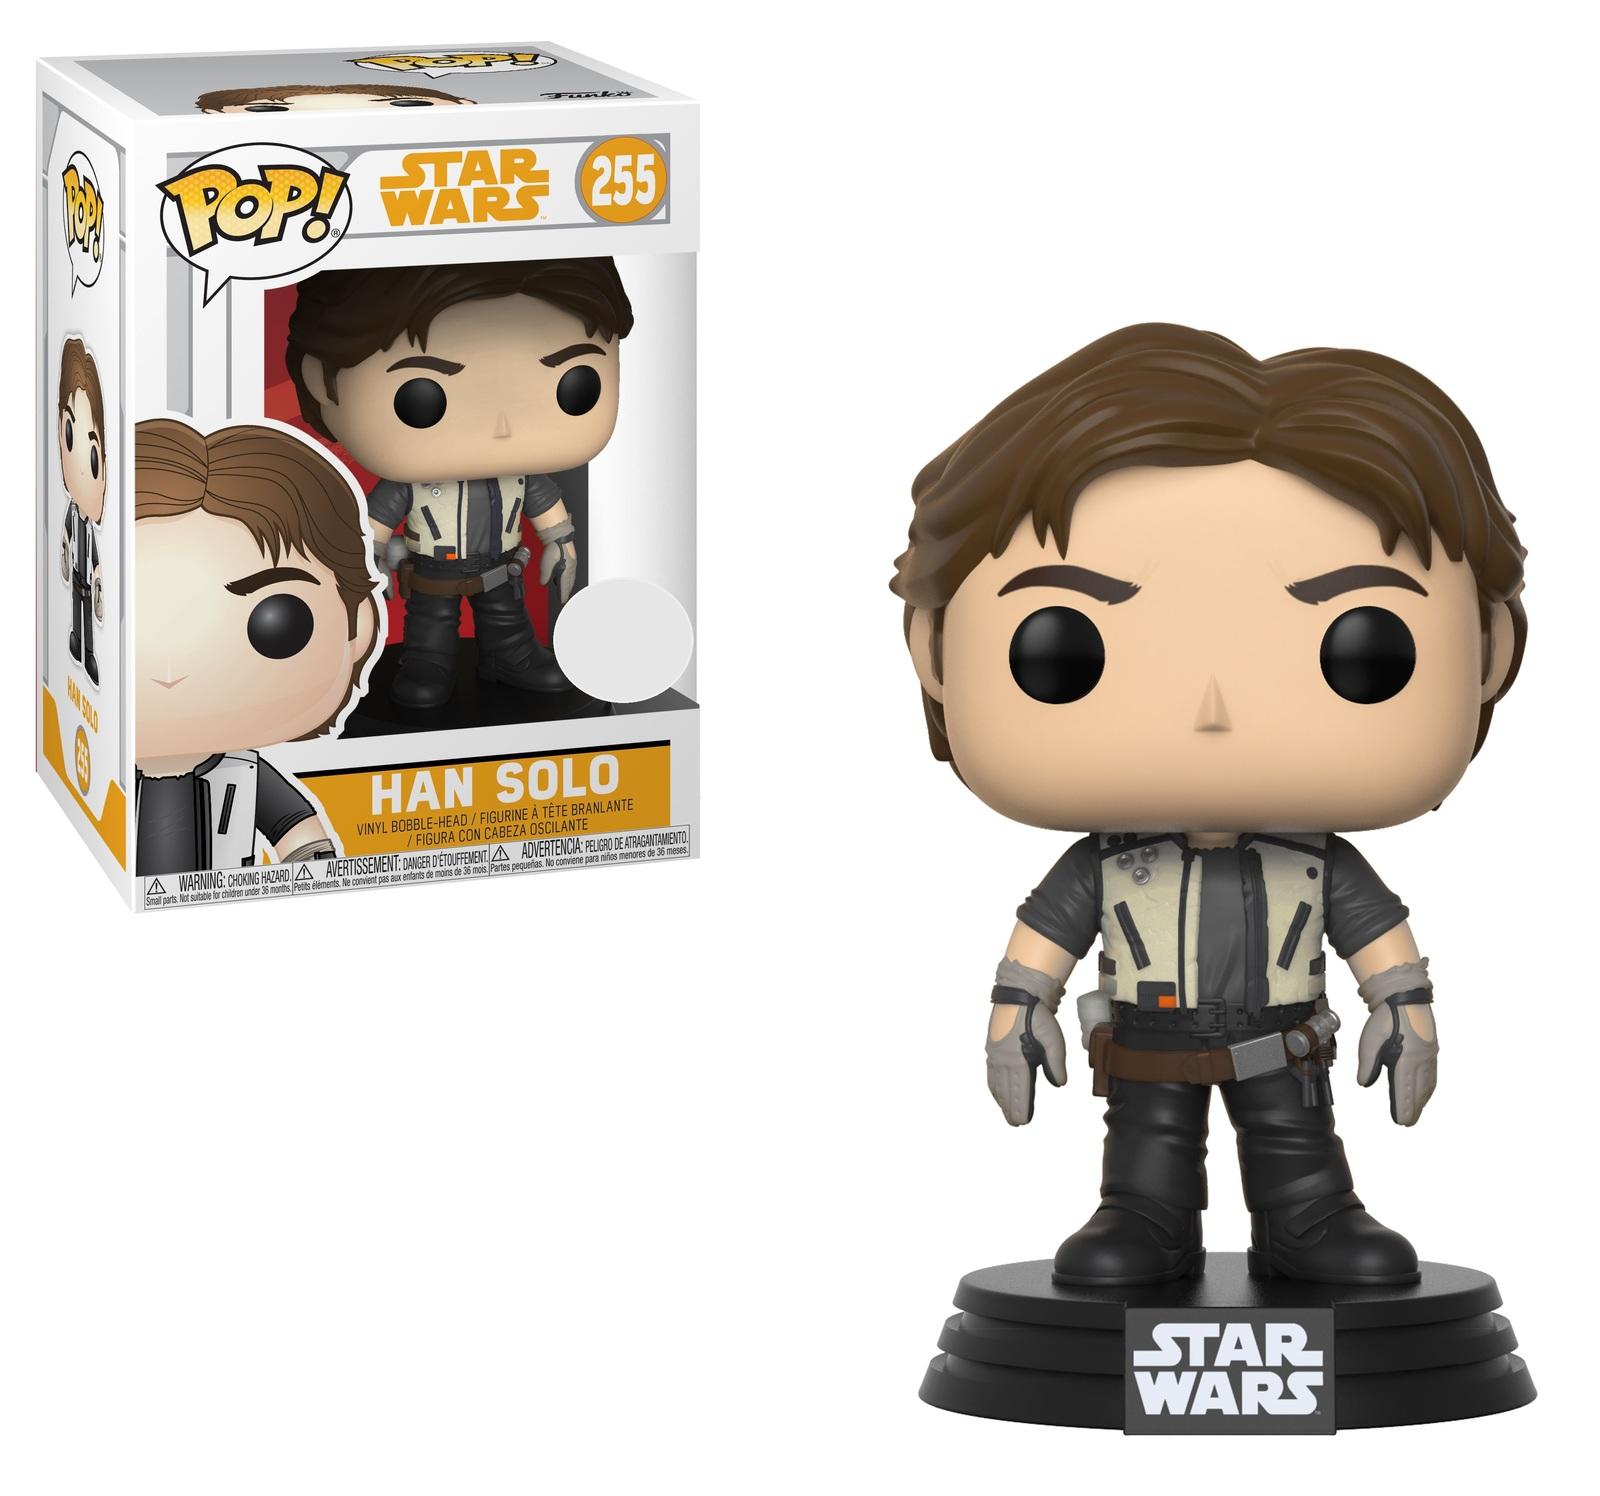 Star Wars: Solo - Han Solo (Variant #1) Pop! Vinyl Figure image